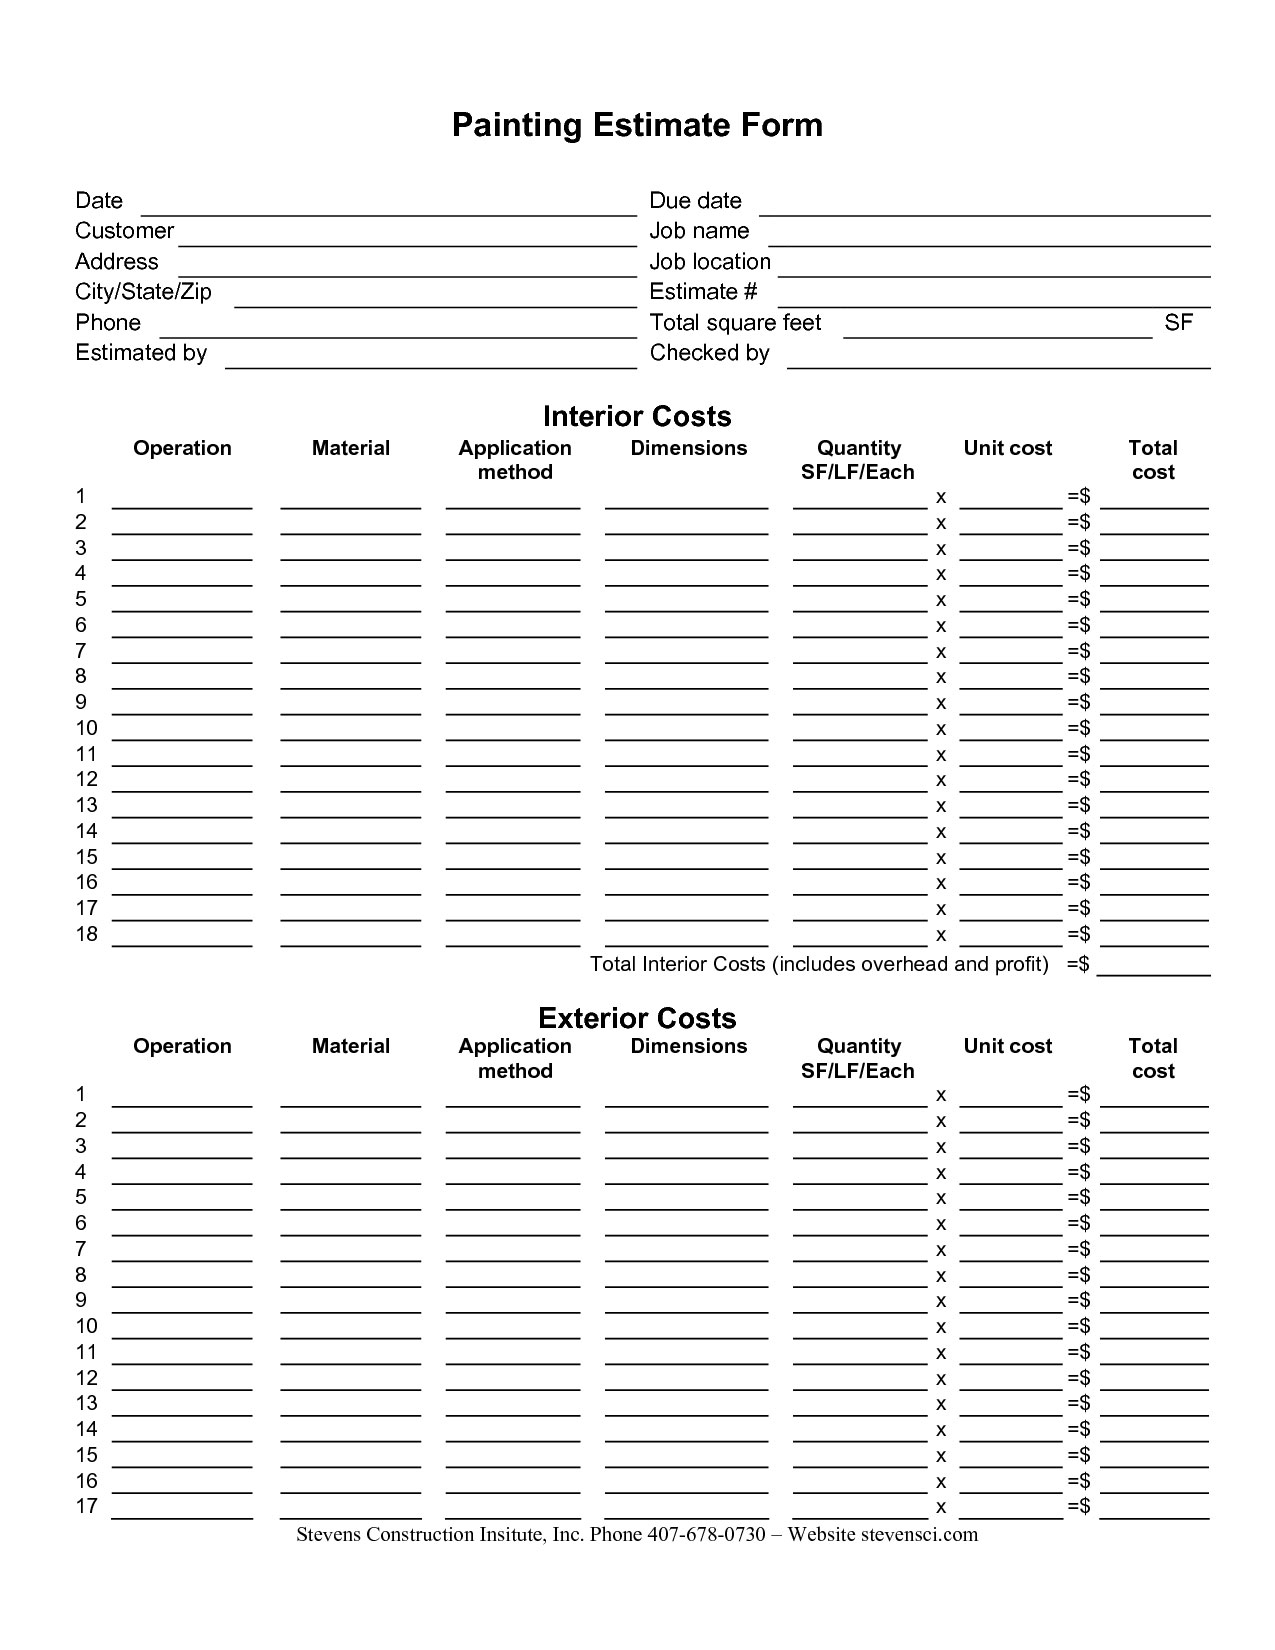 Painting Estimate Form Sample | Painting Estimate Sheet Templates Throughout Construction Estimate Form